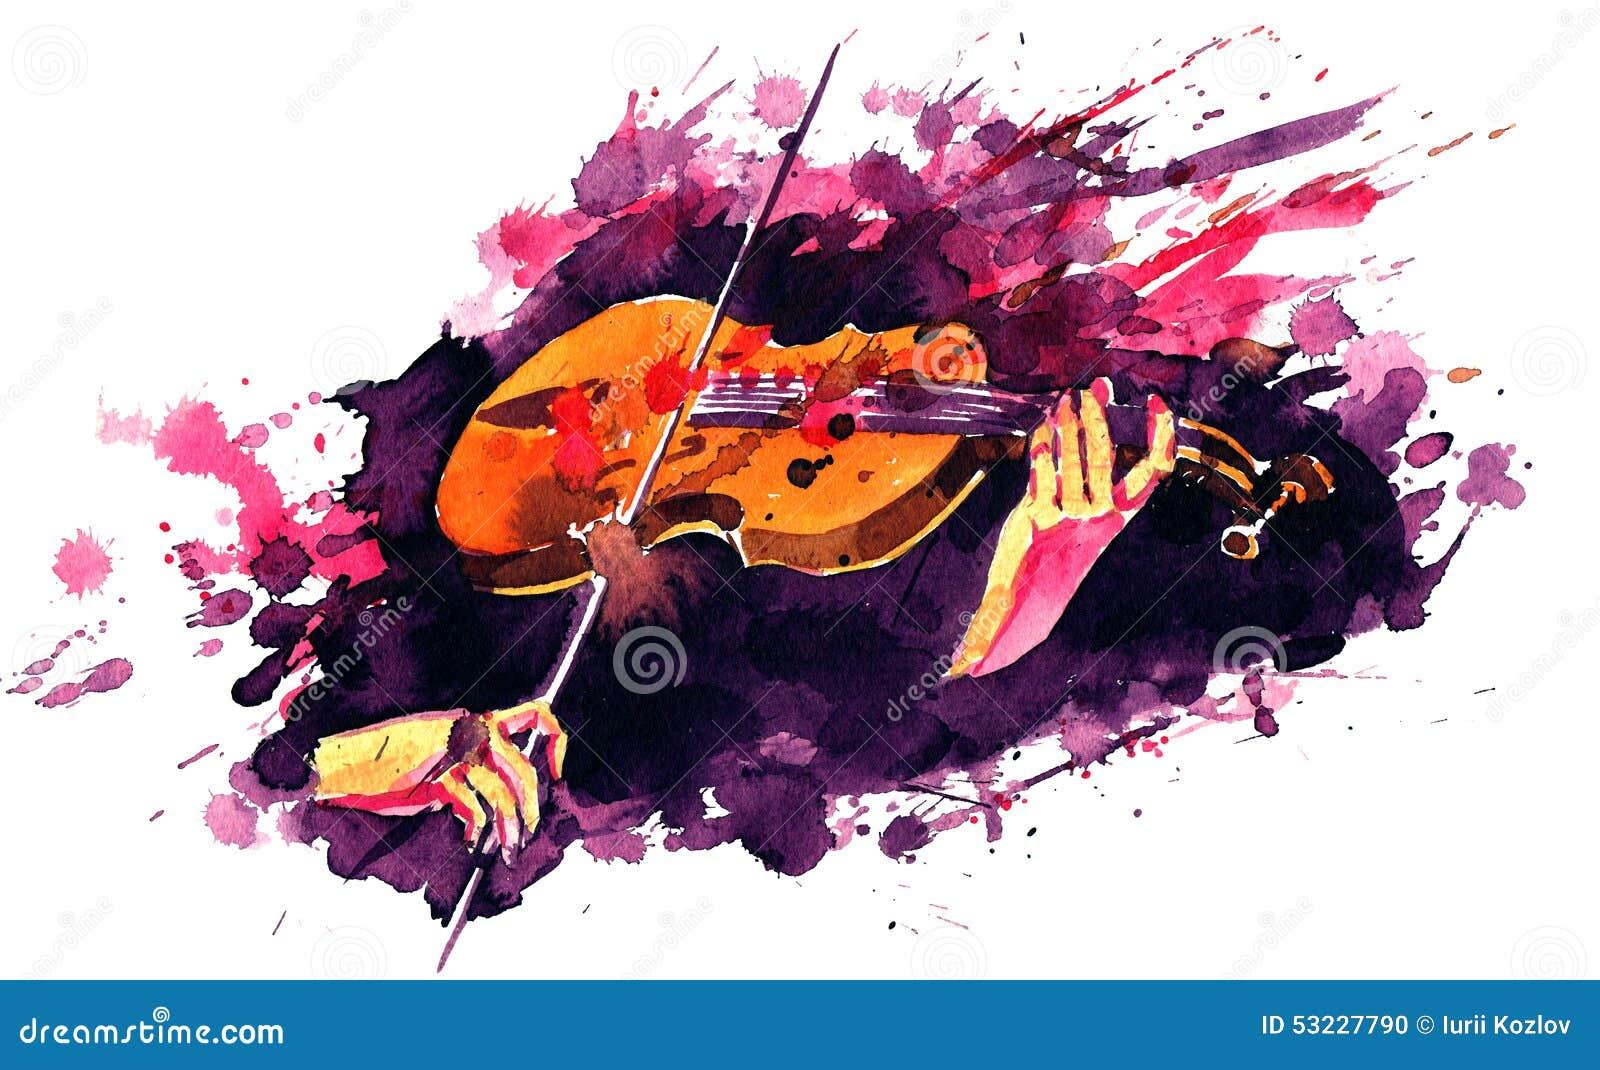 Violin stock illustration  Illustration of classical - 53227790